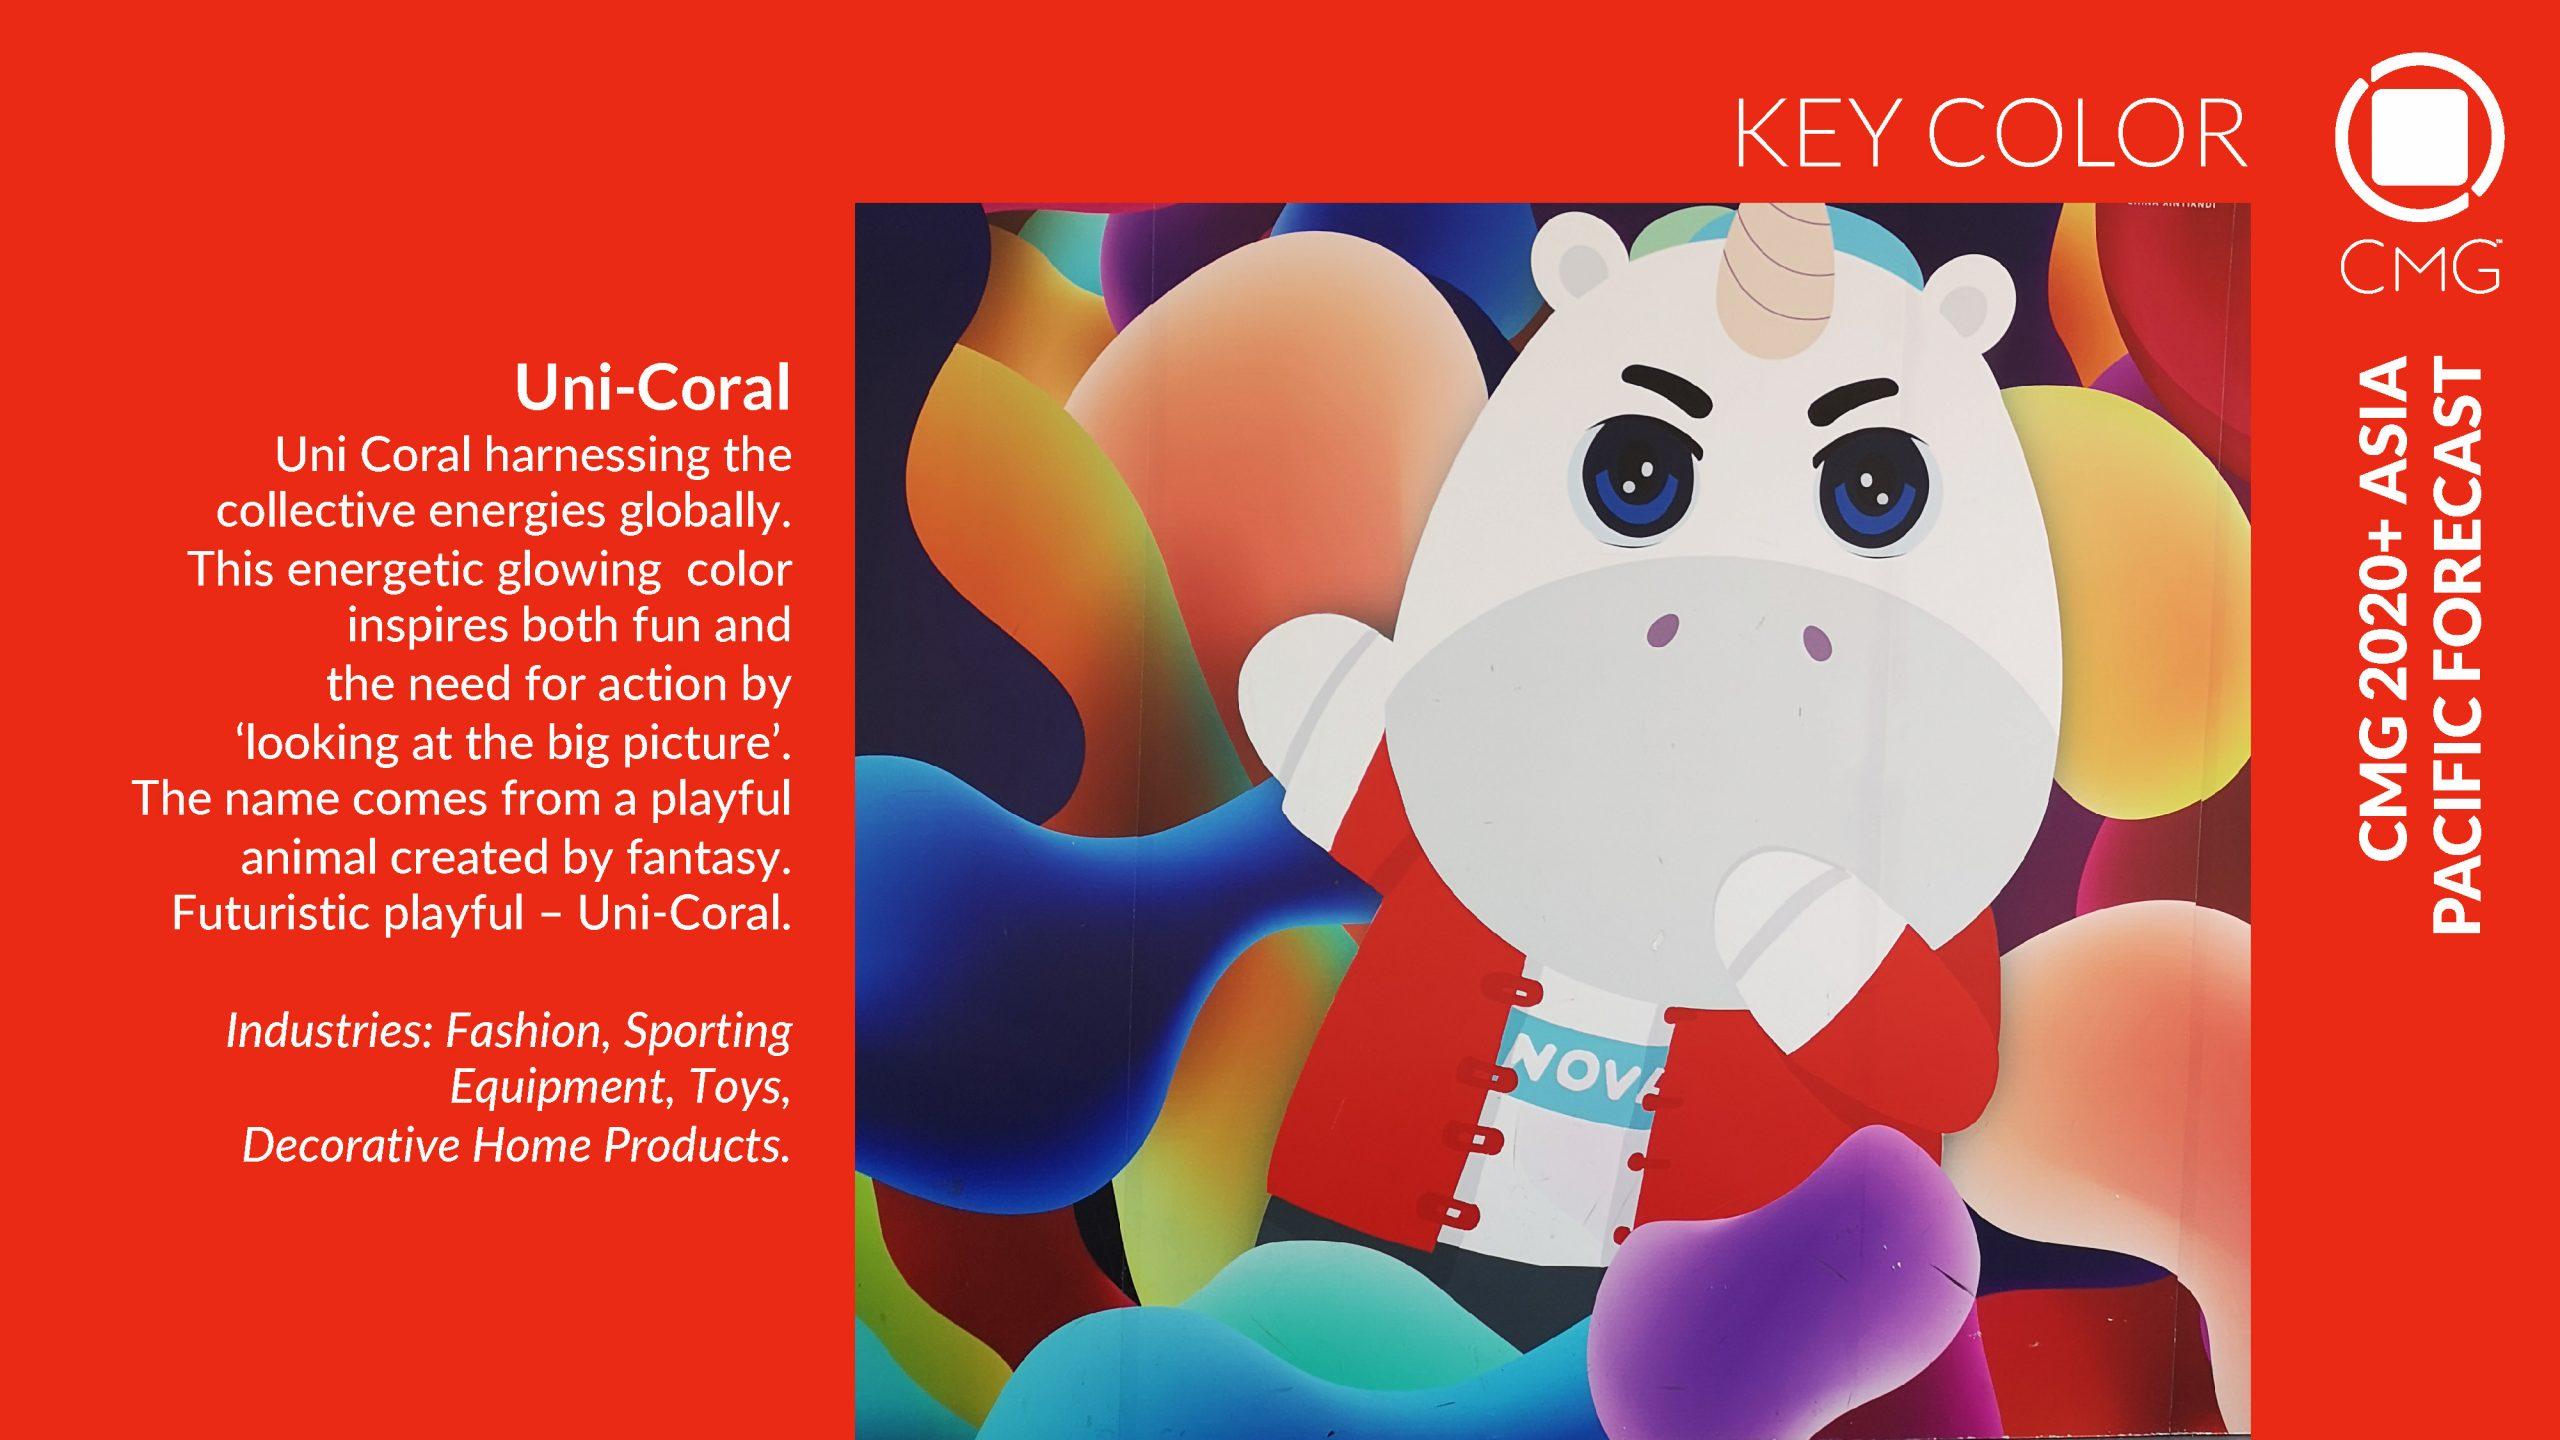 2021 CMG Key Color Uni Coral